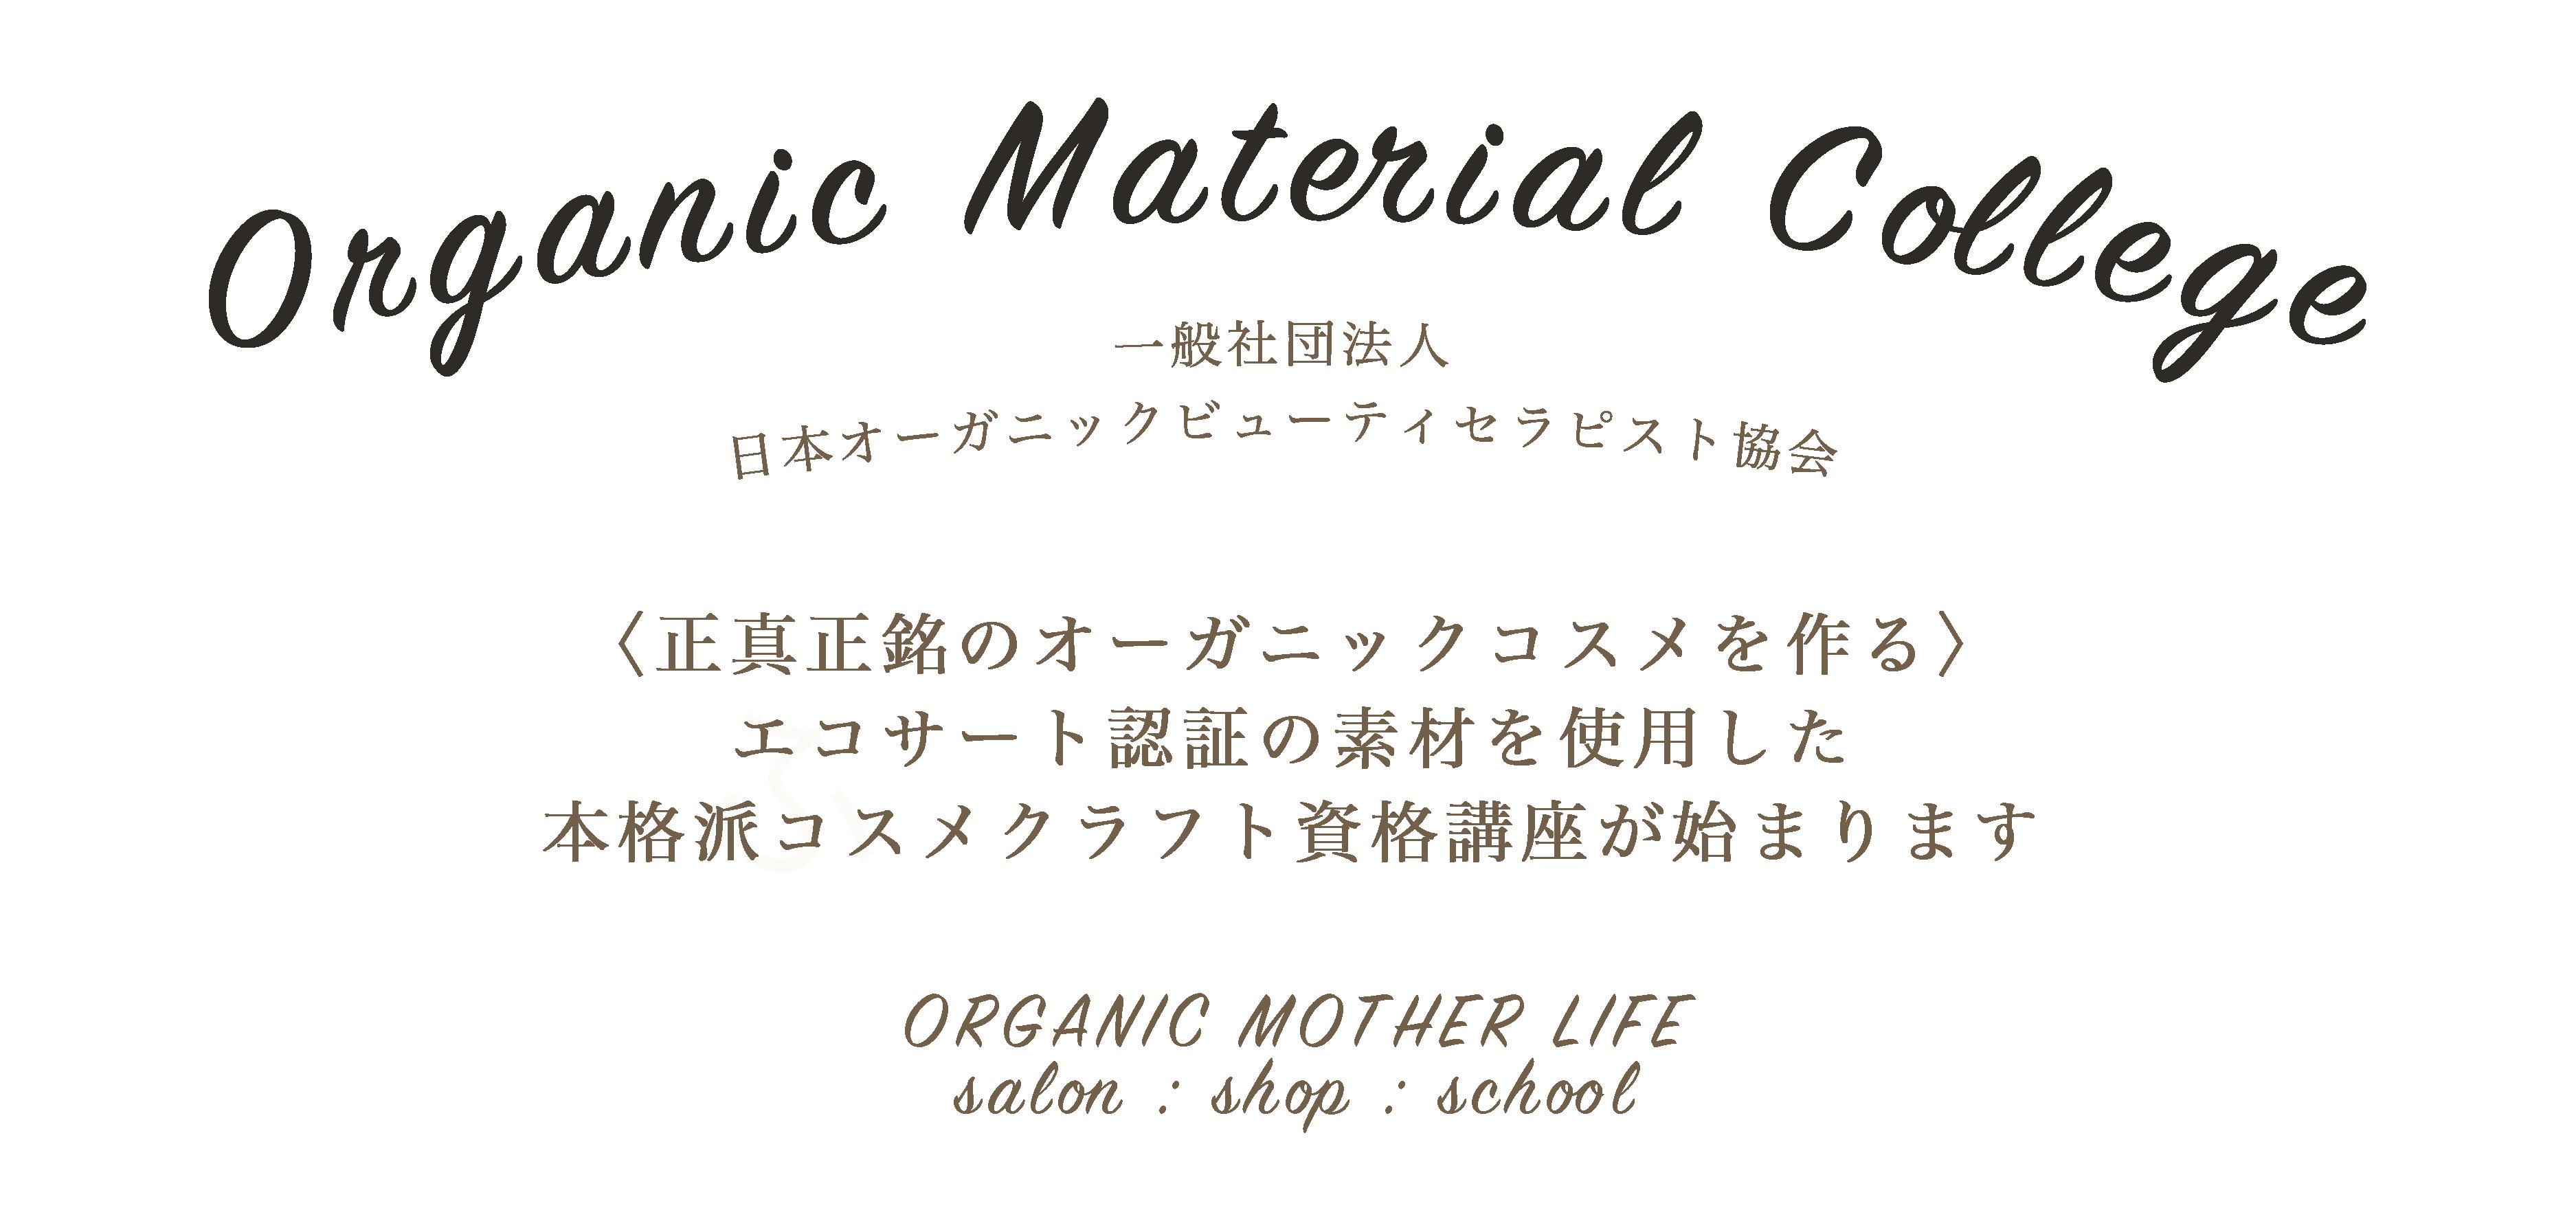 Organic Material College